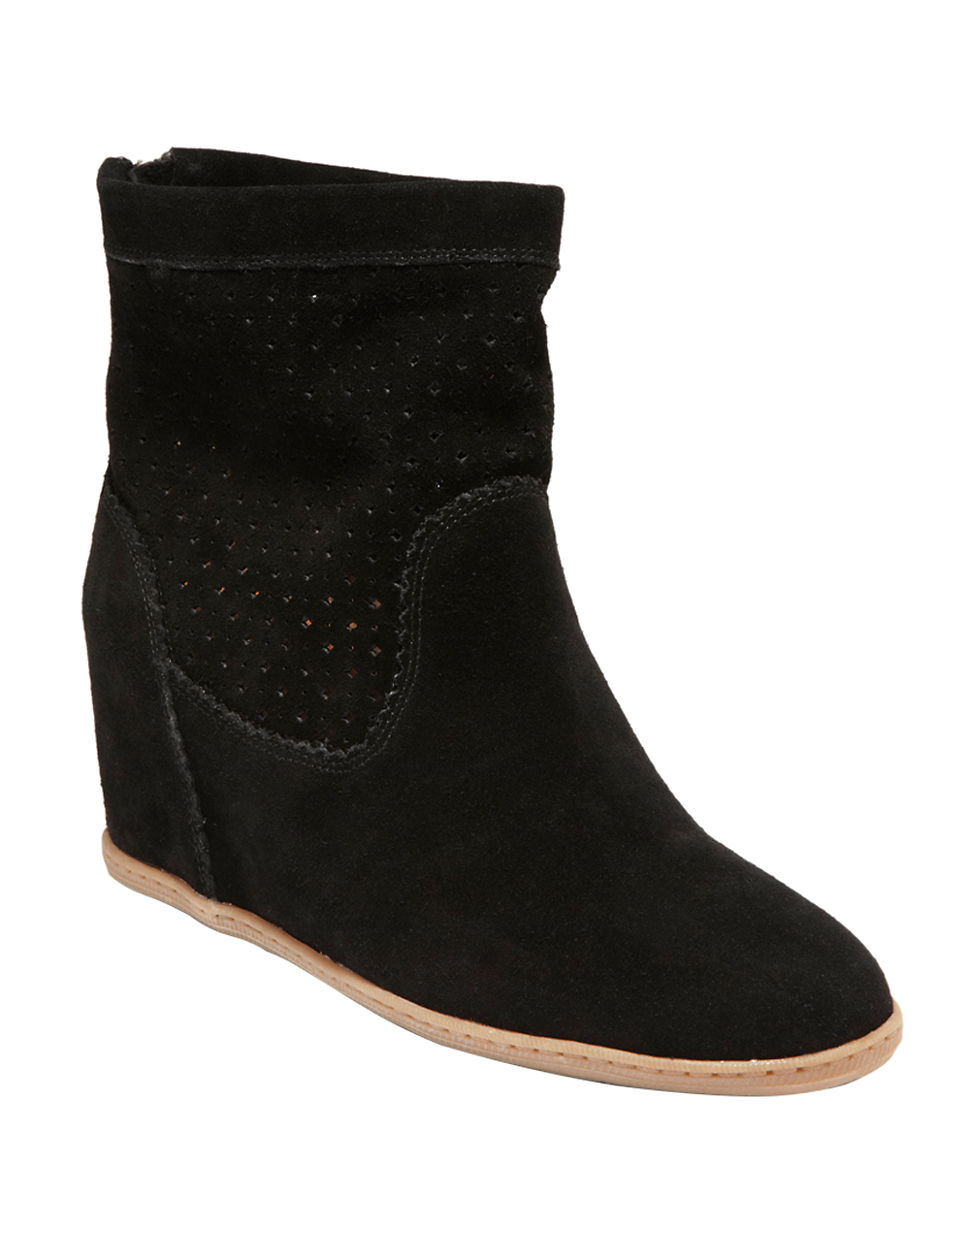 dolce vita krynn suede wedge boots in black lyst